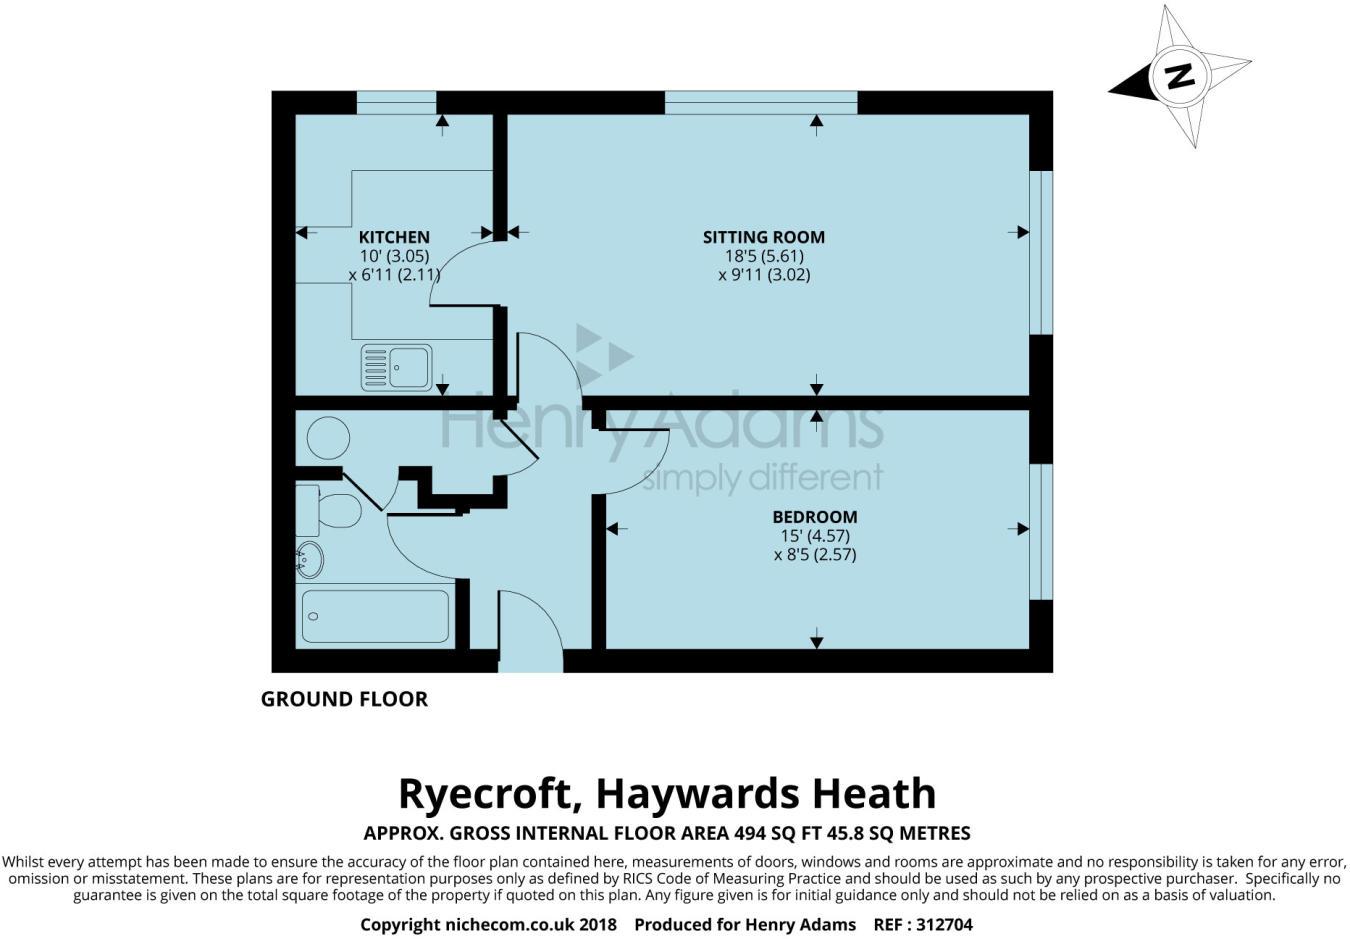 1 bedroom flat for sale in Ryecroft, Haywards Heath, RH16, RH16